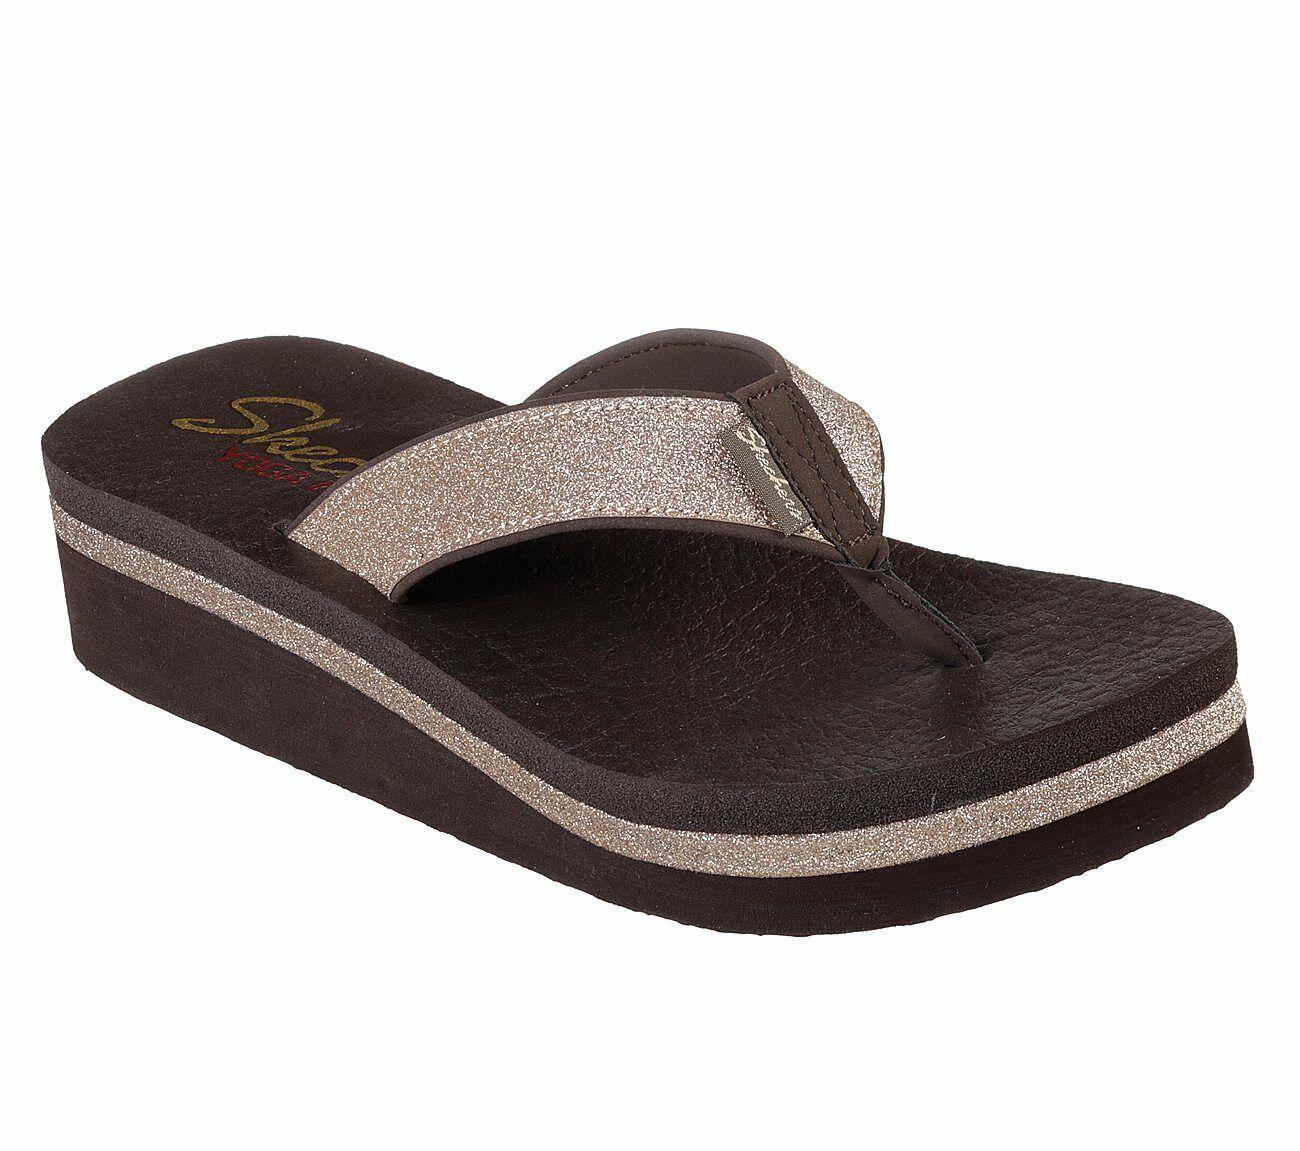 6be88e15ab4a Skechers Vinyasa - Unicorn Mist Flip Flops Womens Wedge Toe Post Sandals  31605